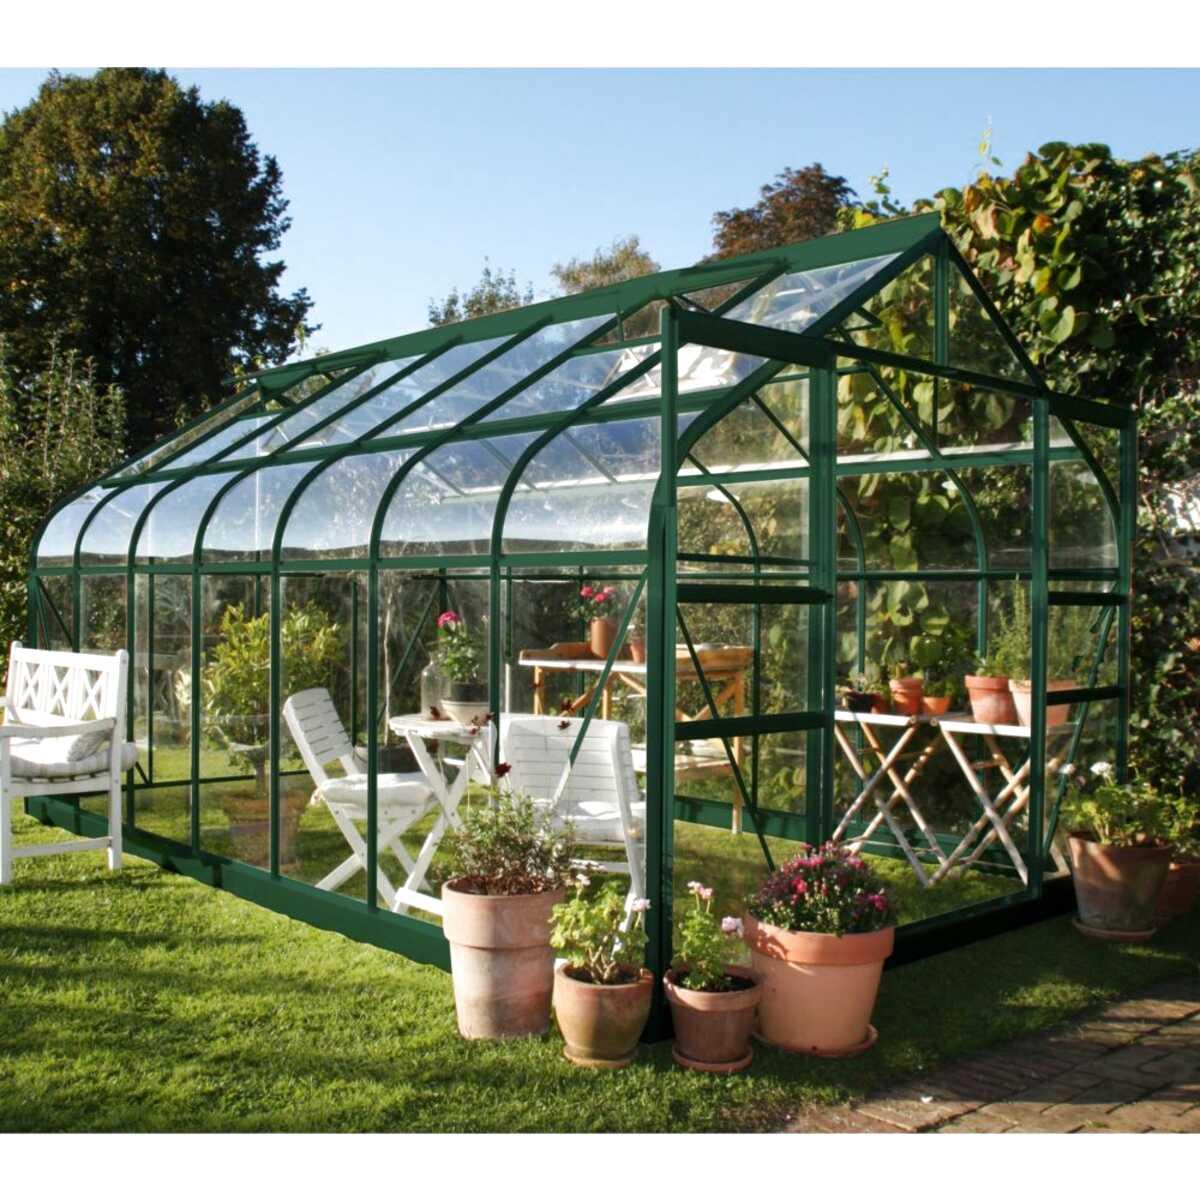 serre de jardin supreme verre trempe 114m2 embase halls 5 serre jardin